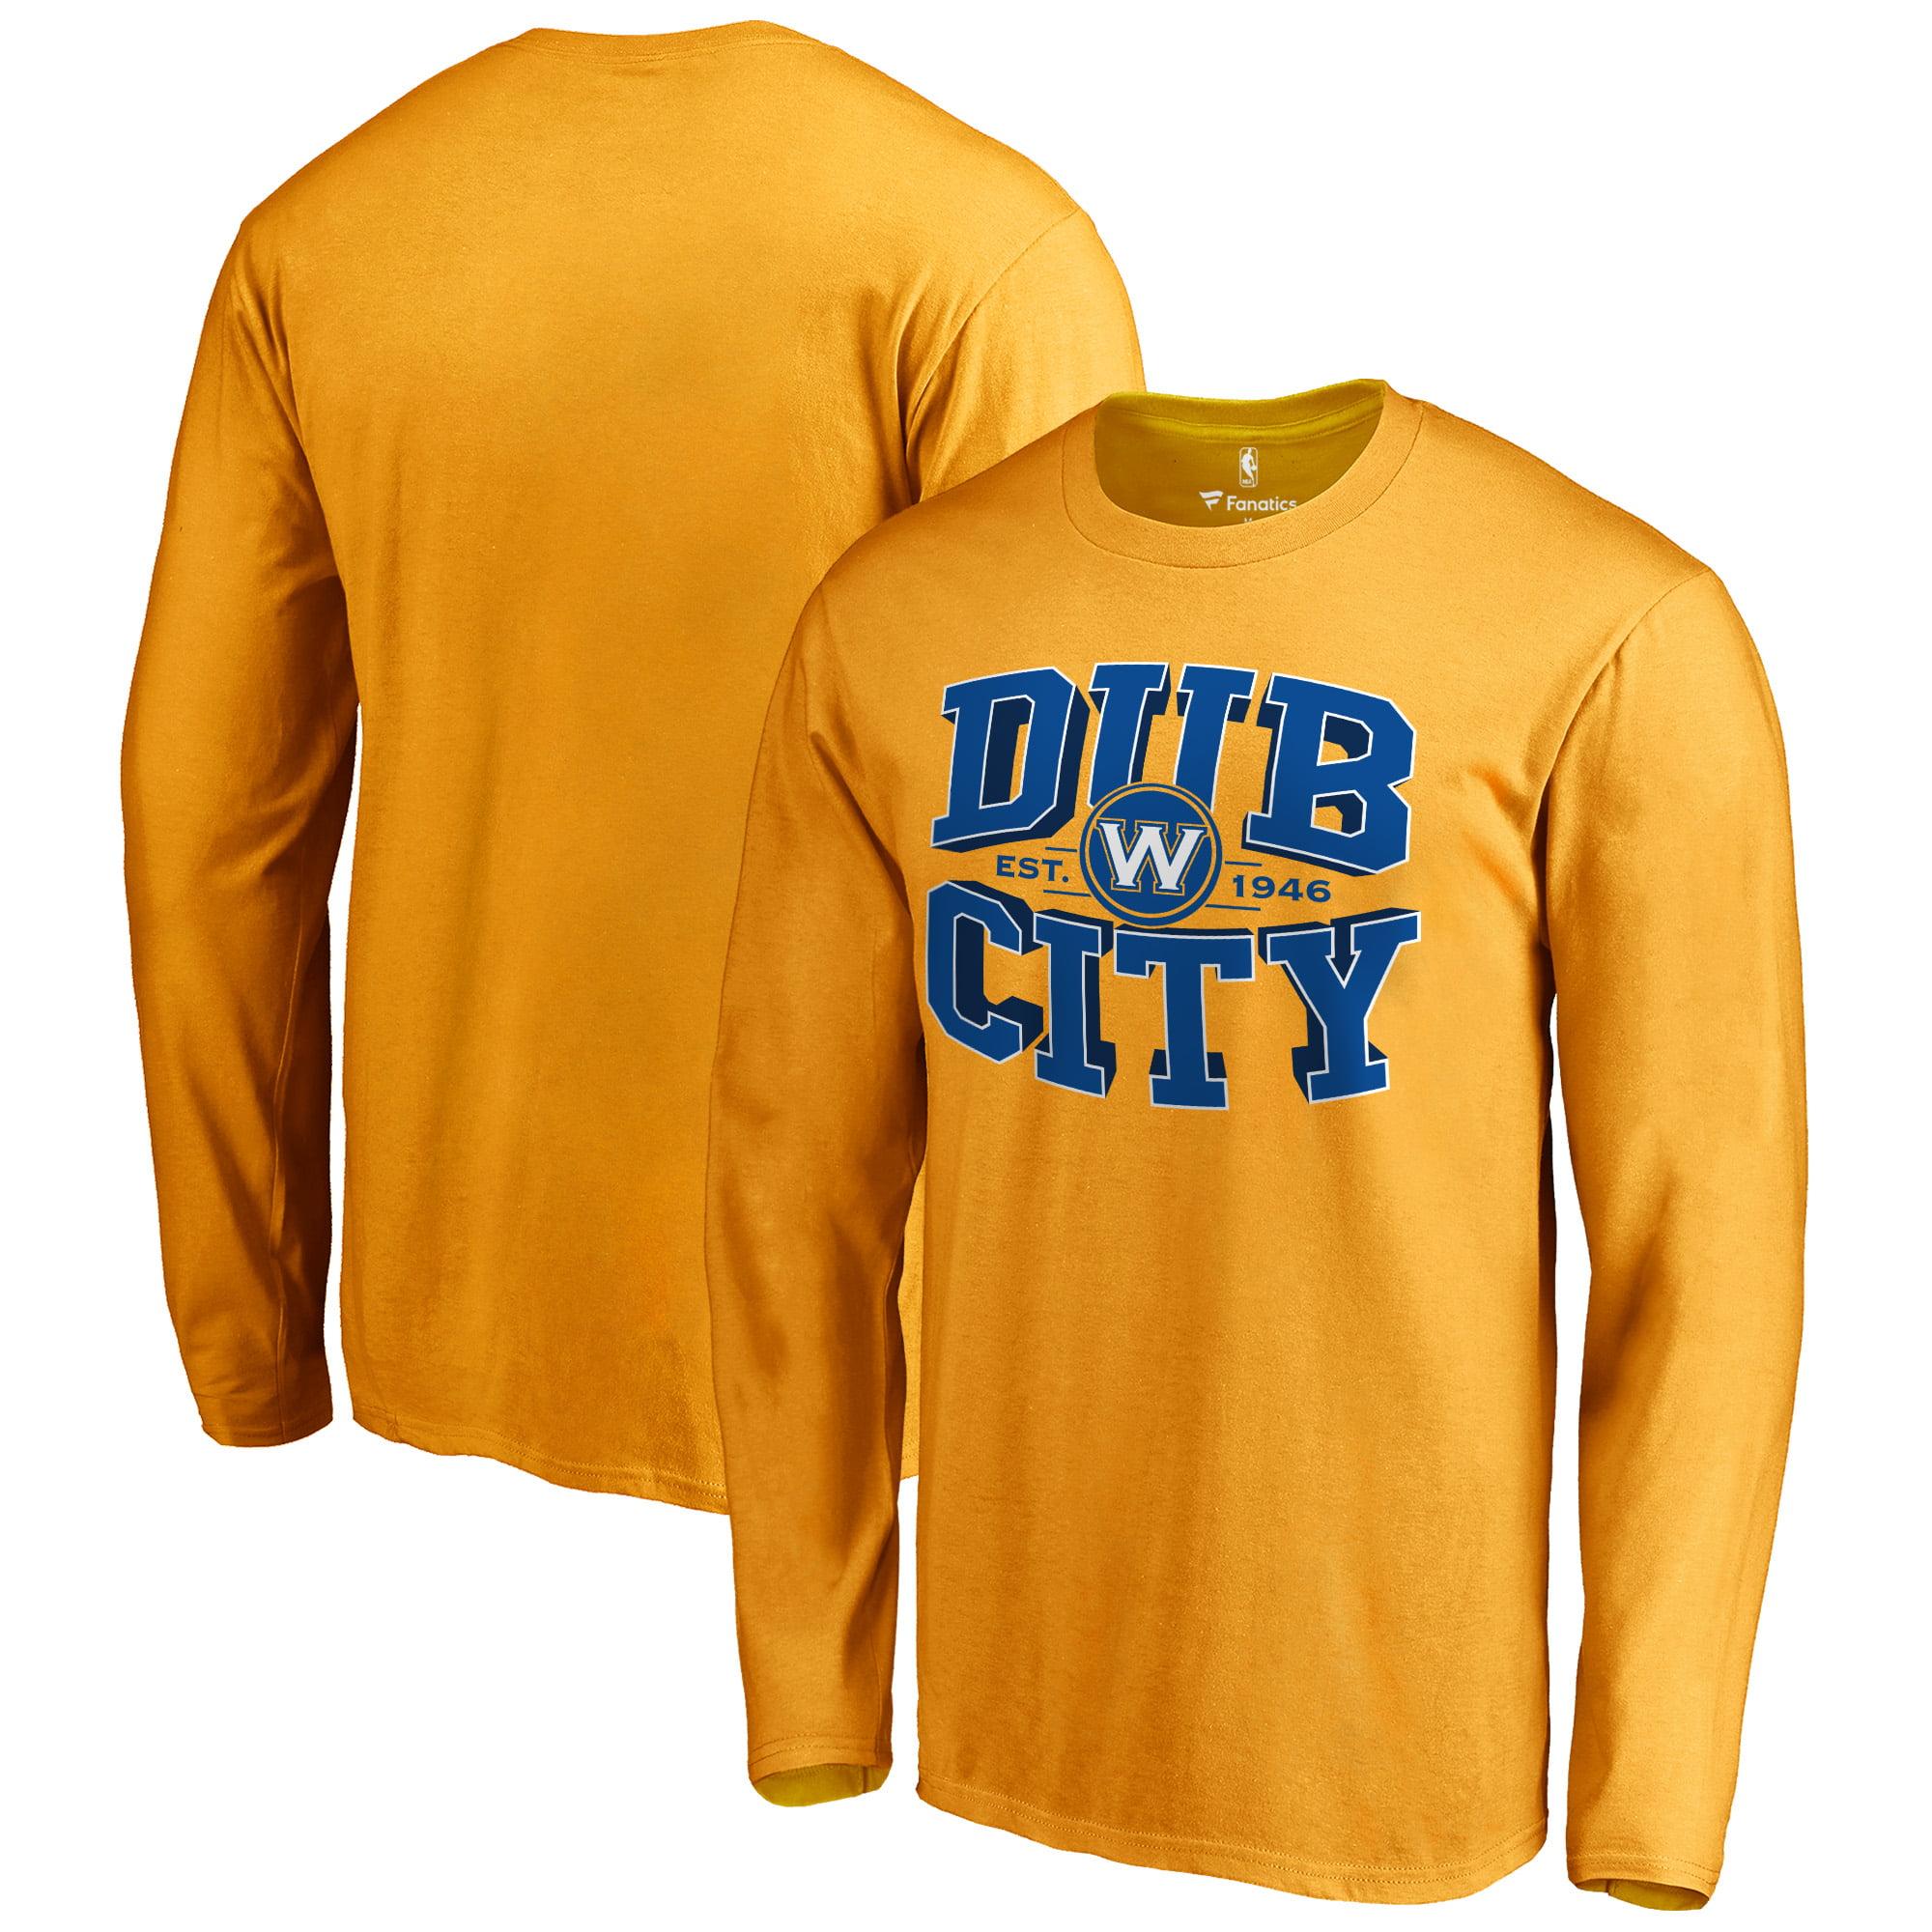 Golden State Warriors Fanatics Branded Hometown Collection Dub City Long Sleeve T-Shirt - Gold